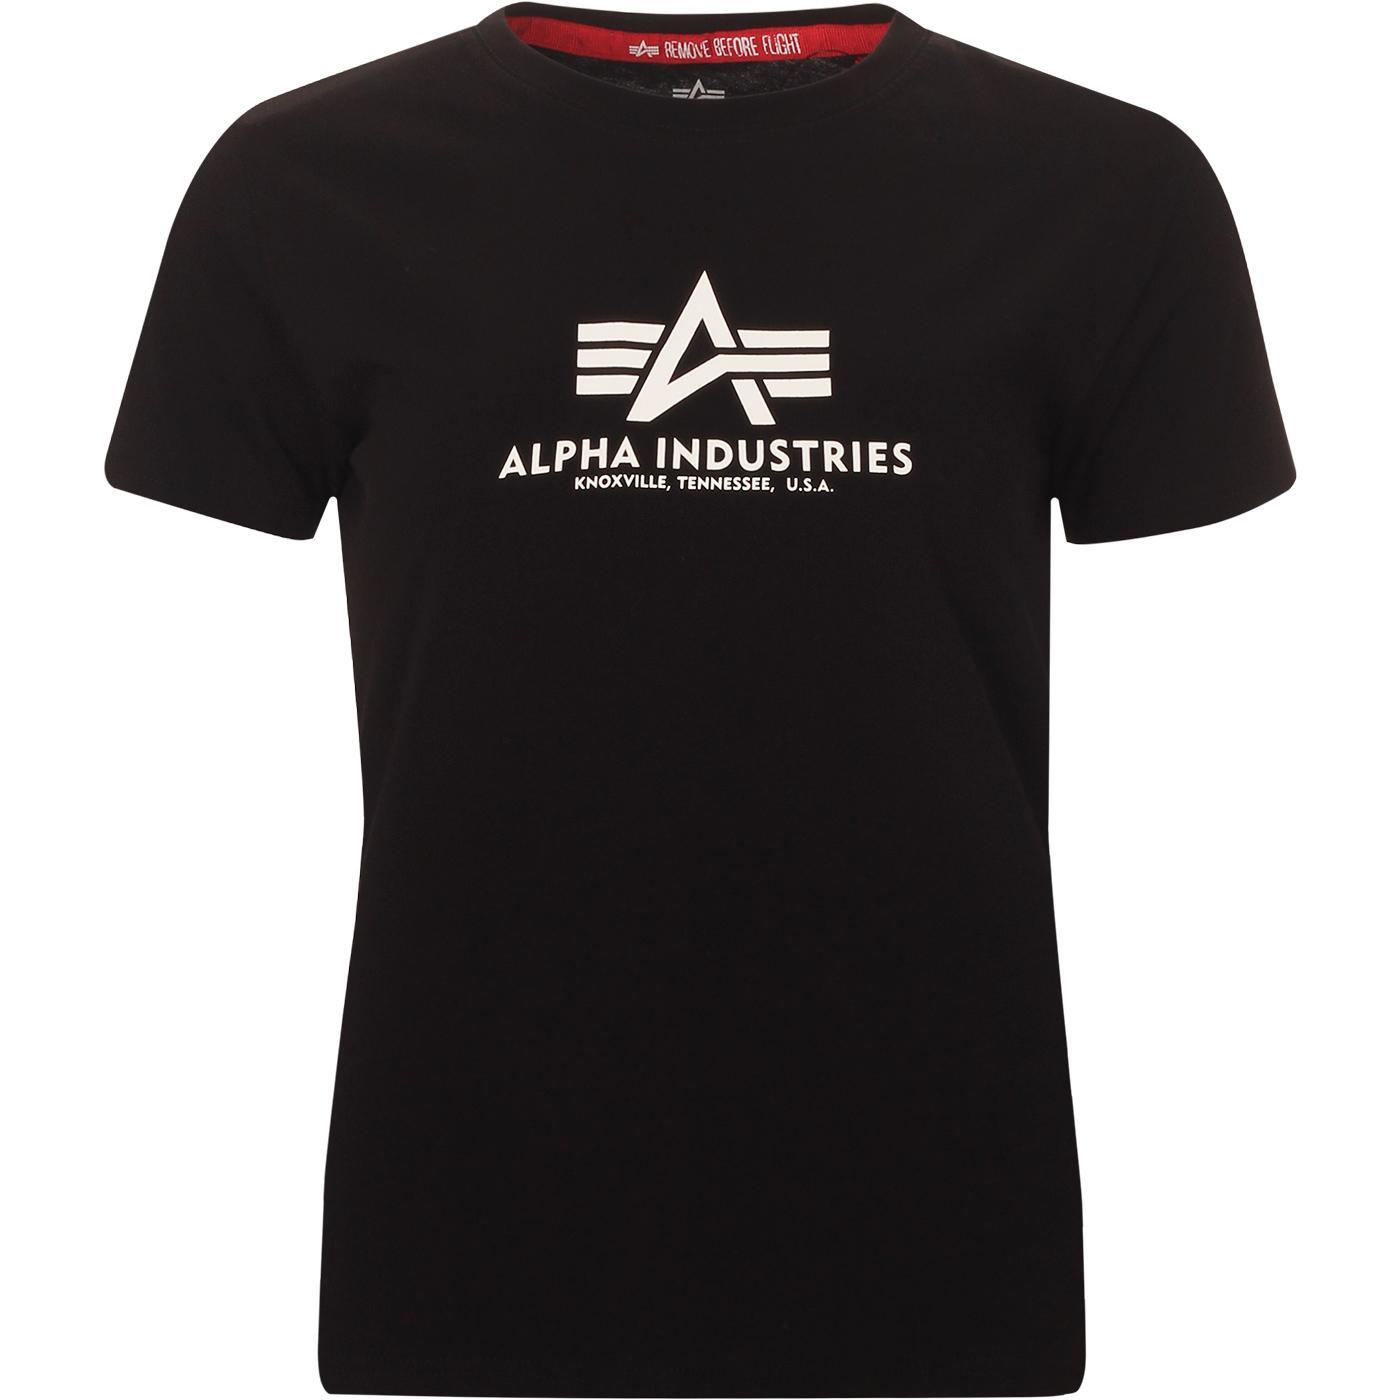 ALPHA INDUSTRIES Women's Retro Logo Tee (Black)